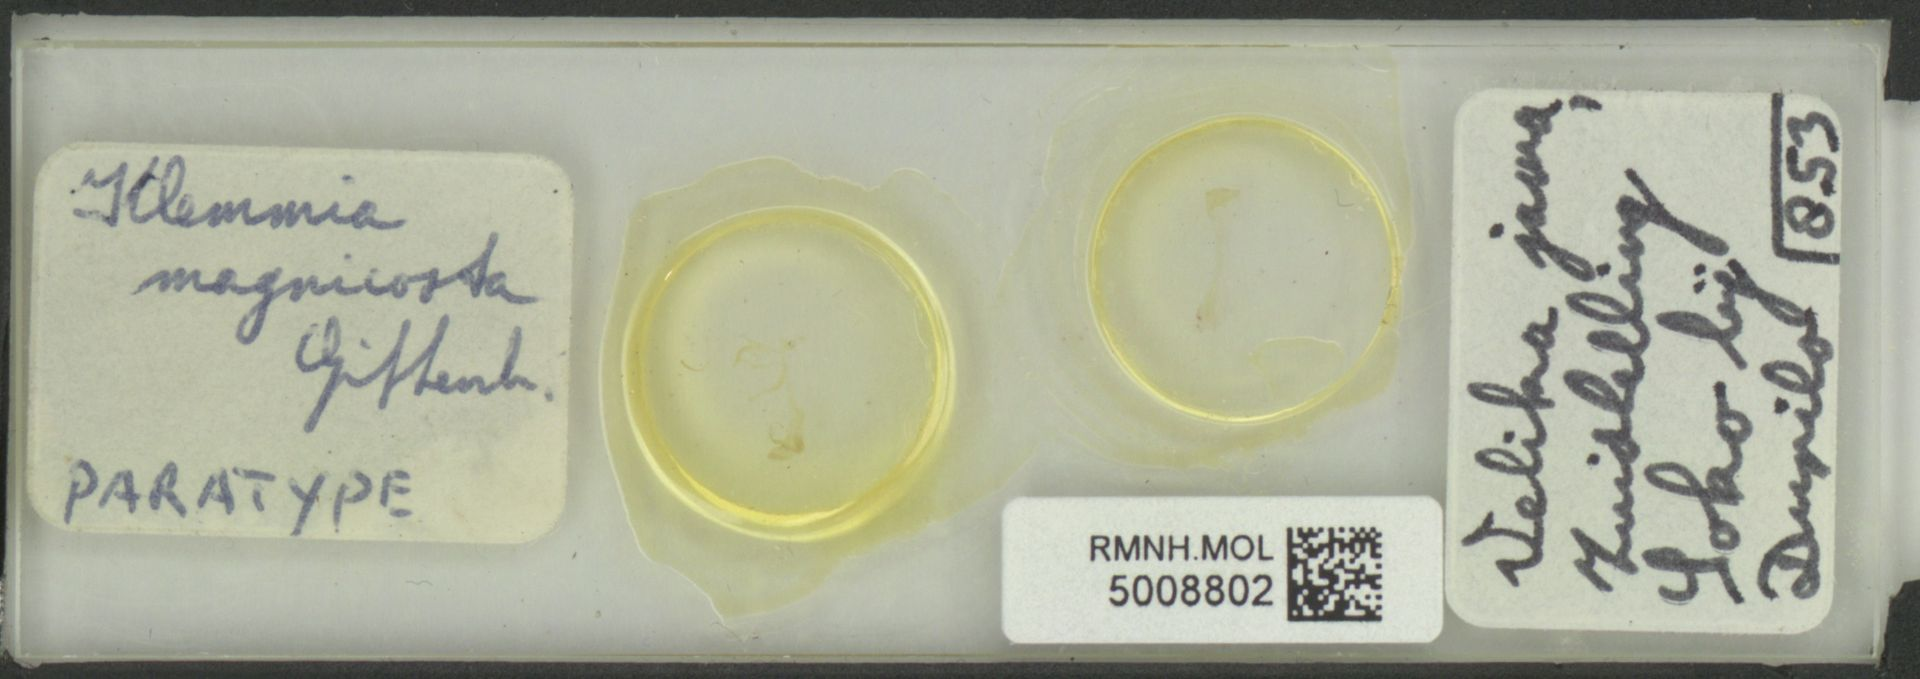 RMNH.MOL.5008802 | Klemmia magnicosta Gittenberger, 1975